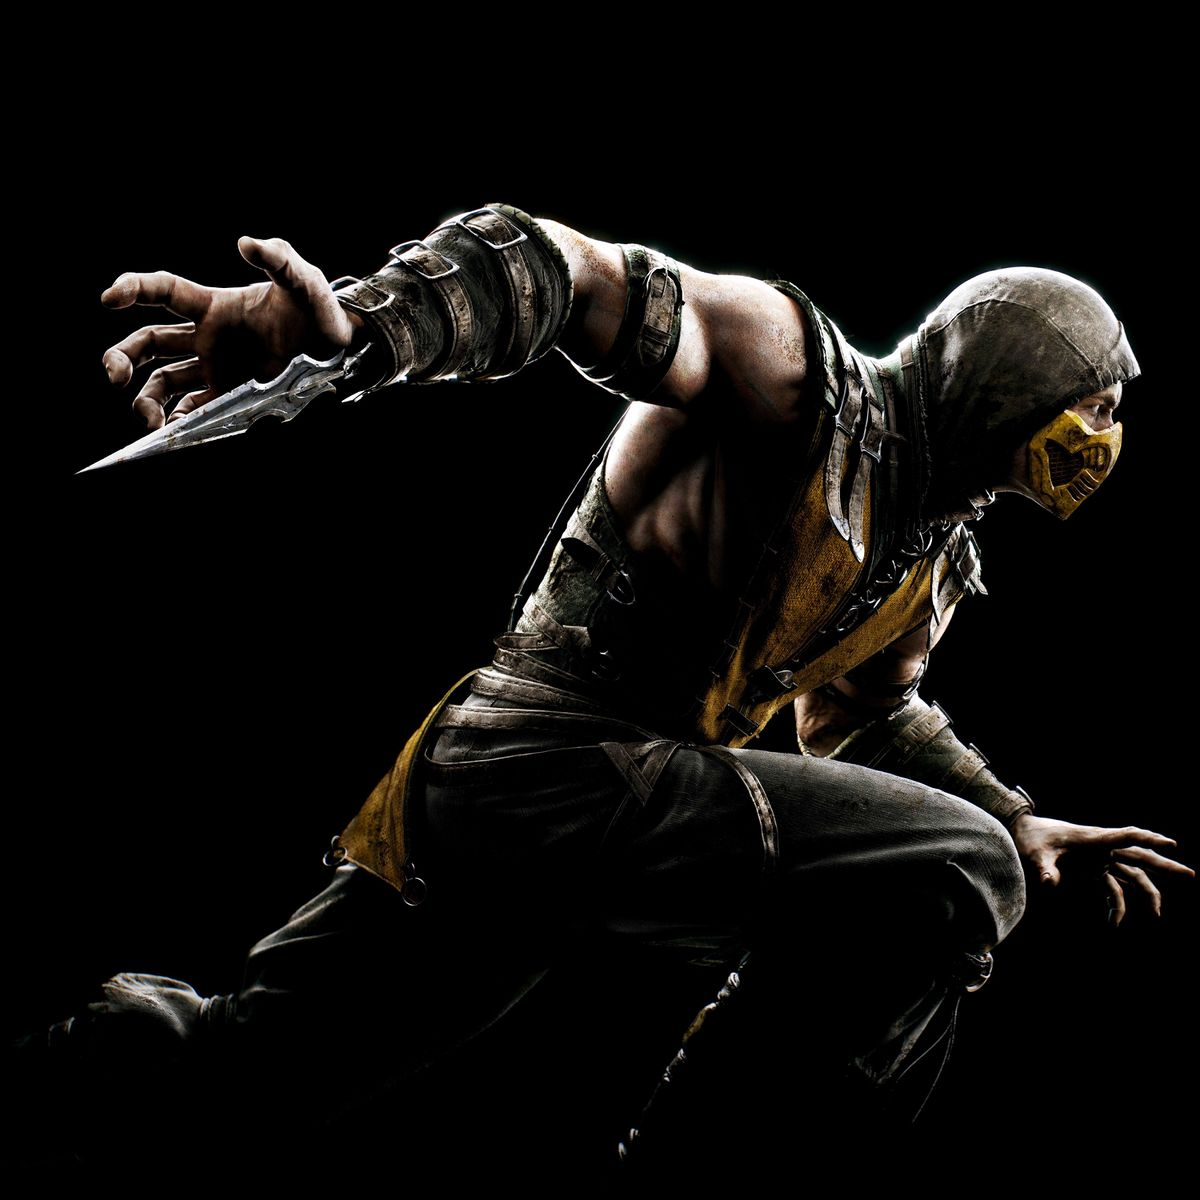 Scorpion Mortal Kombat Codex Gamicus Humanity S Collective